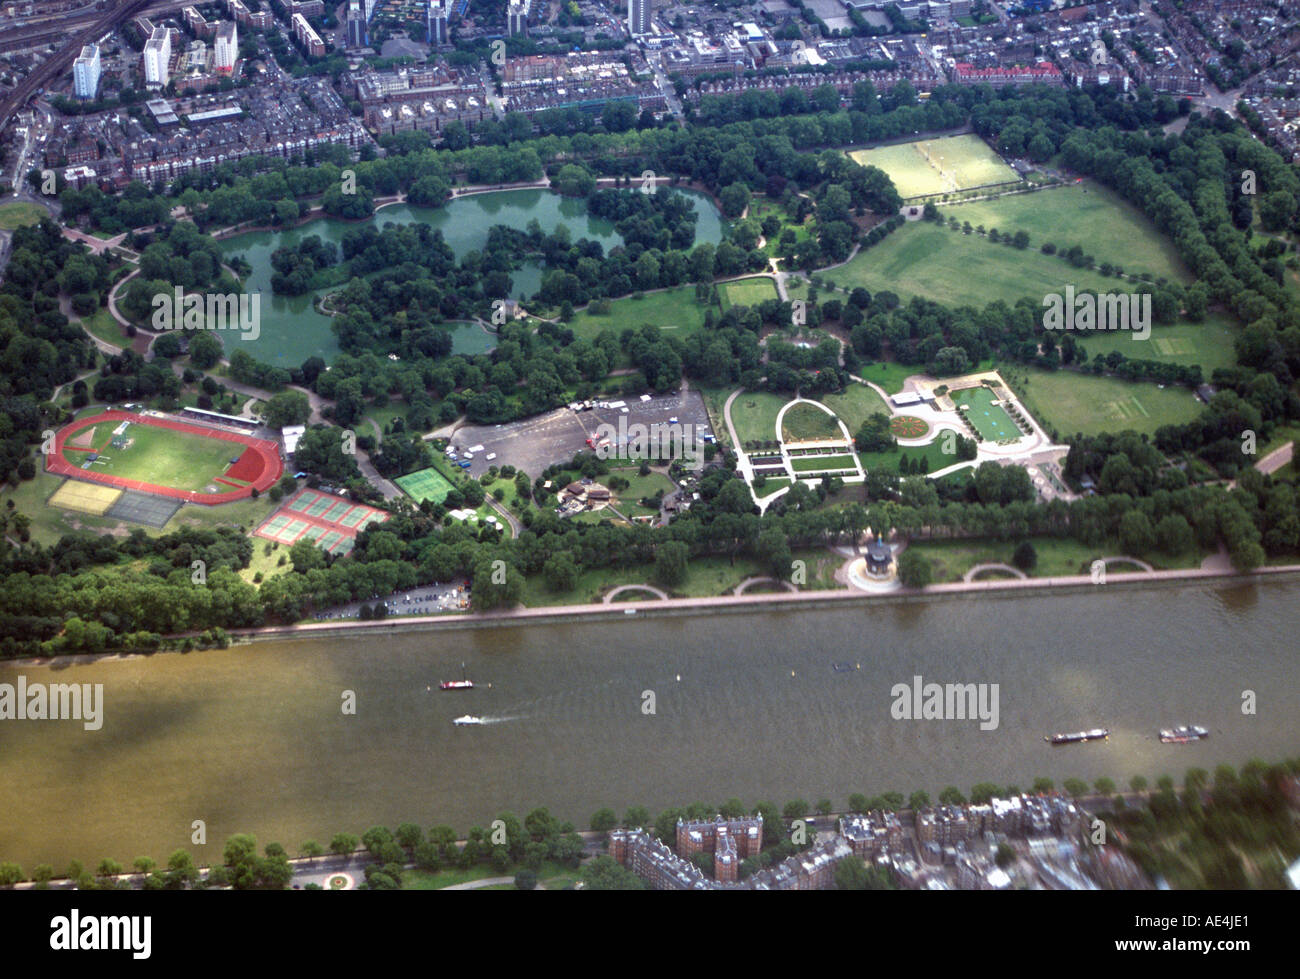 Buy A Car Park In London